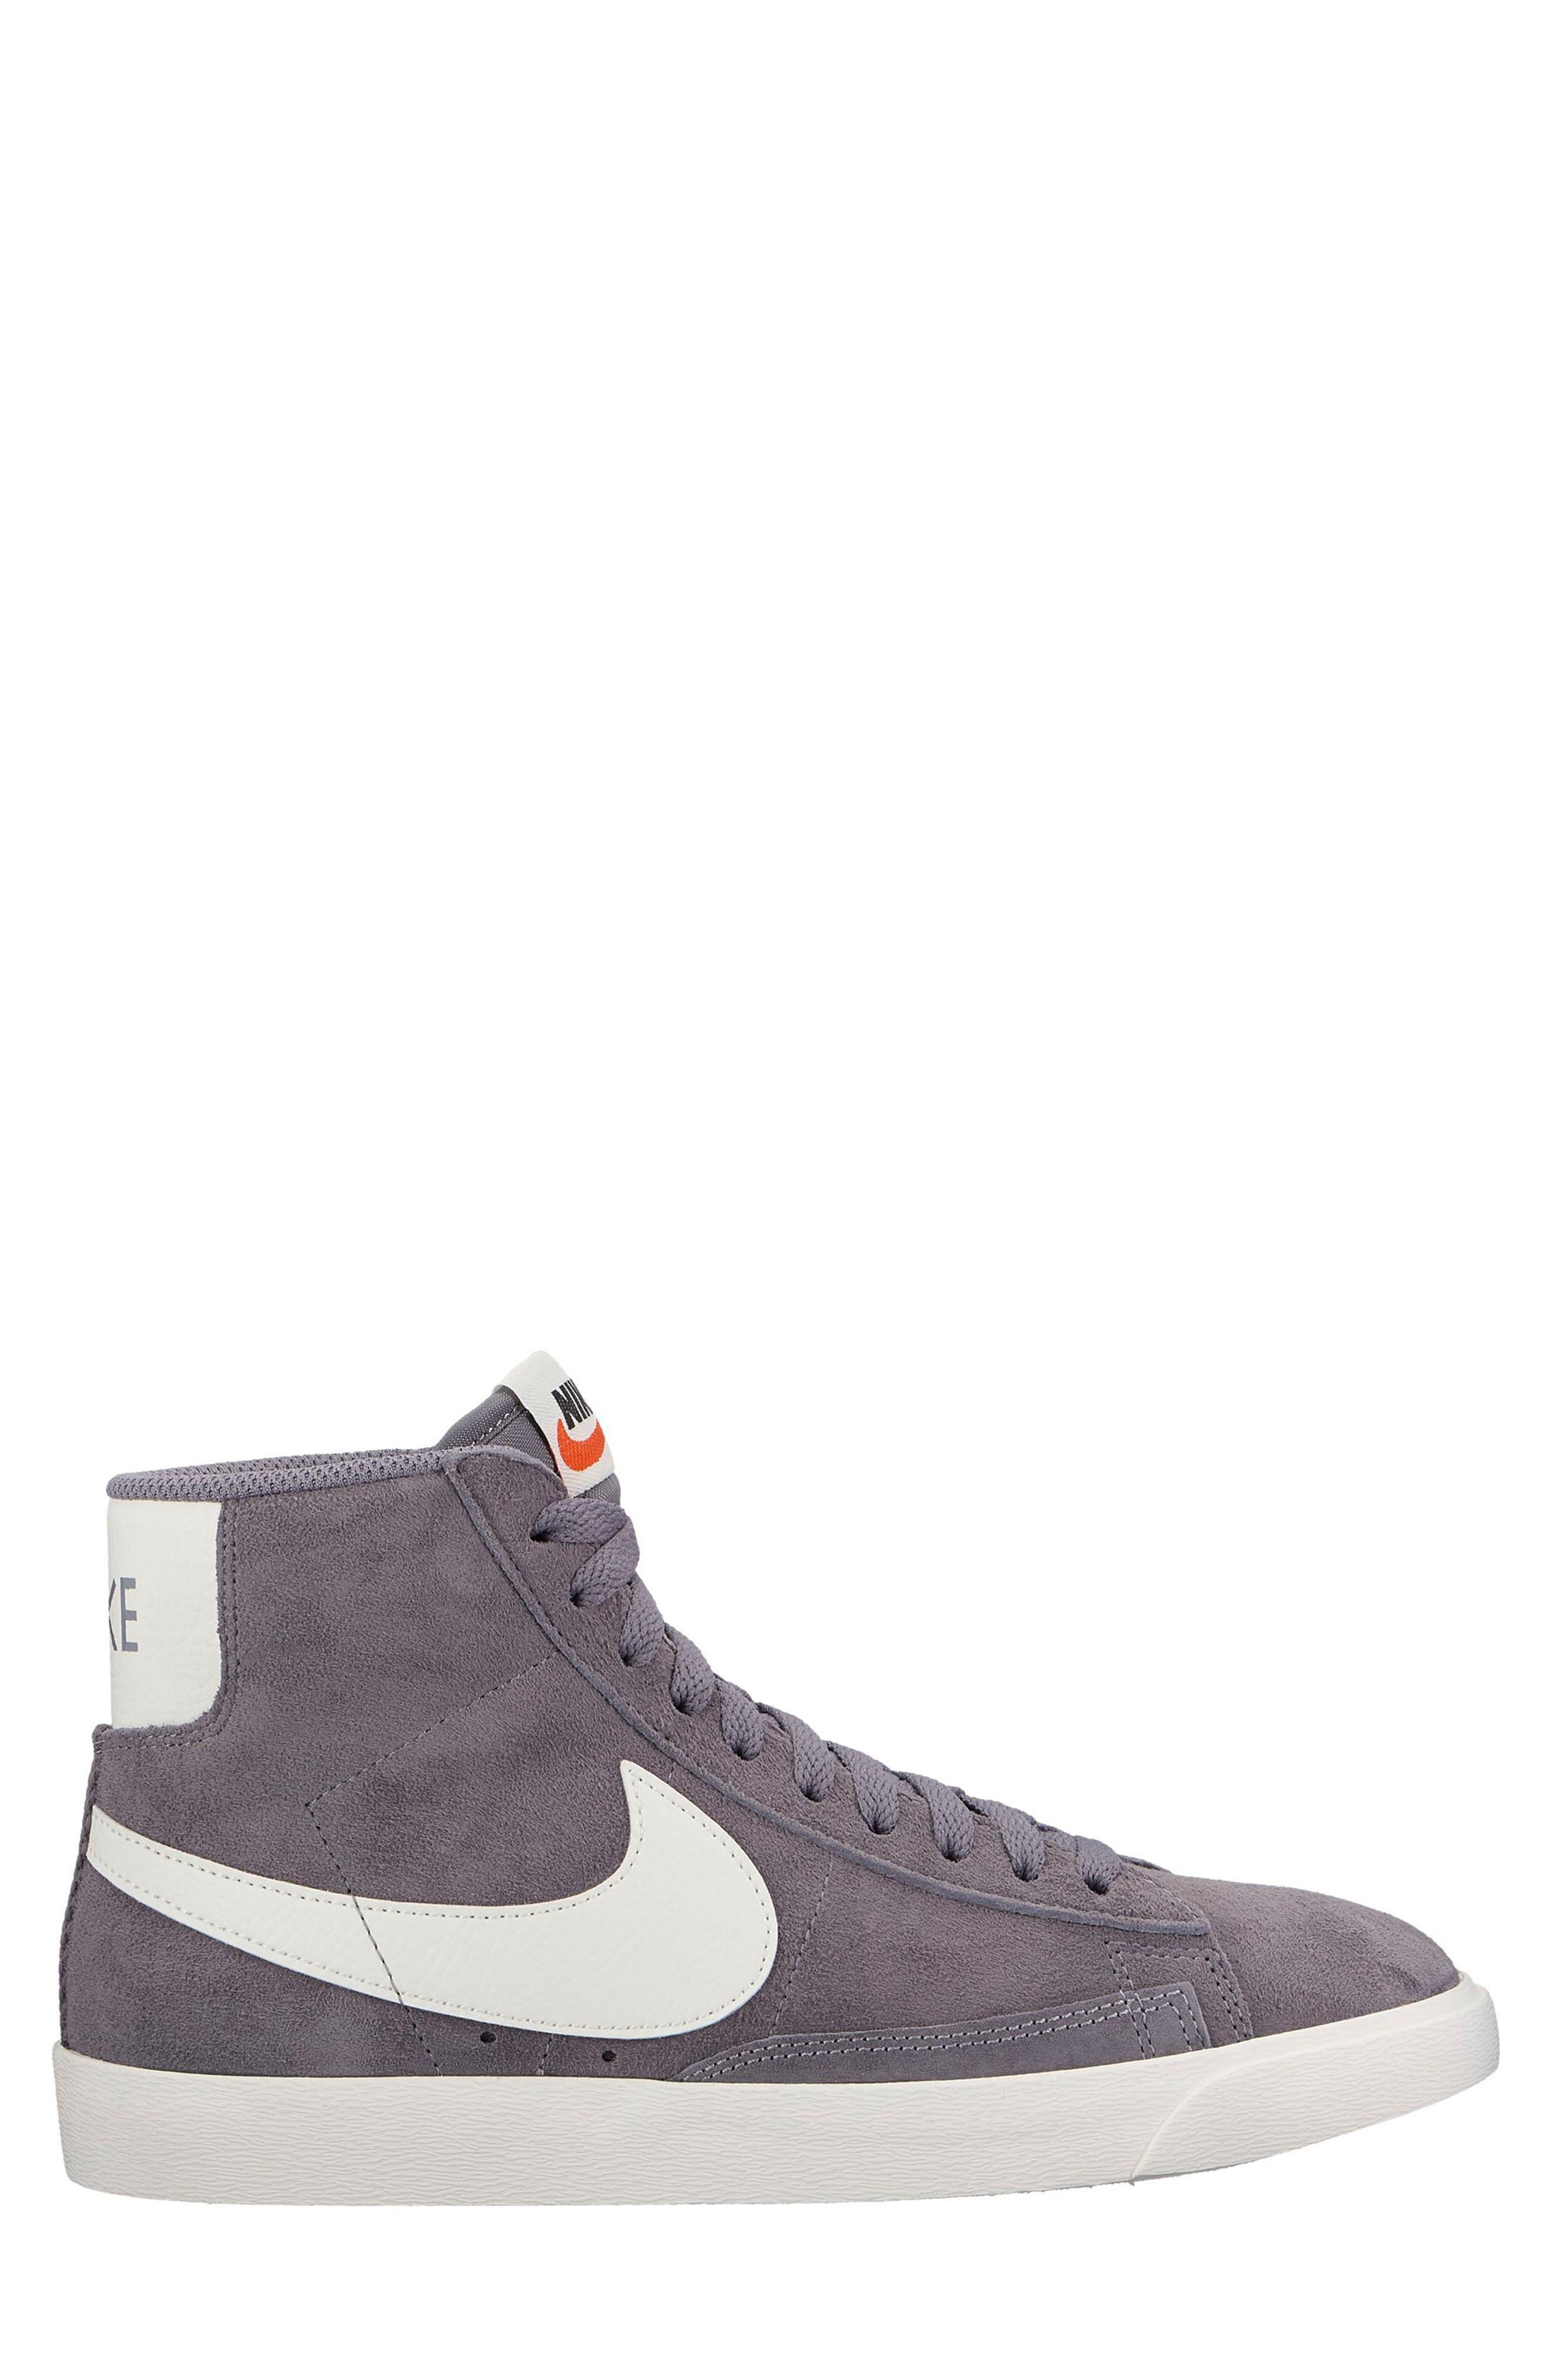 Blazer Mid Top Sneaker,                             Main thumbnail 1, color,                             Smoke/ Sail